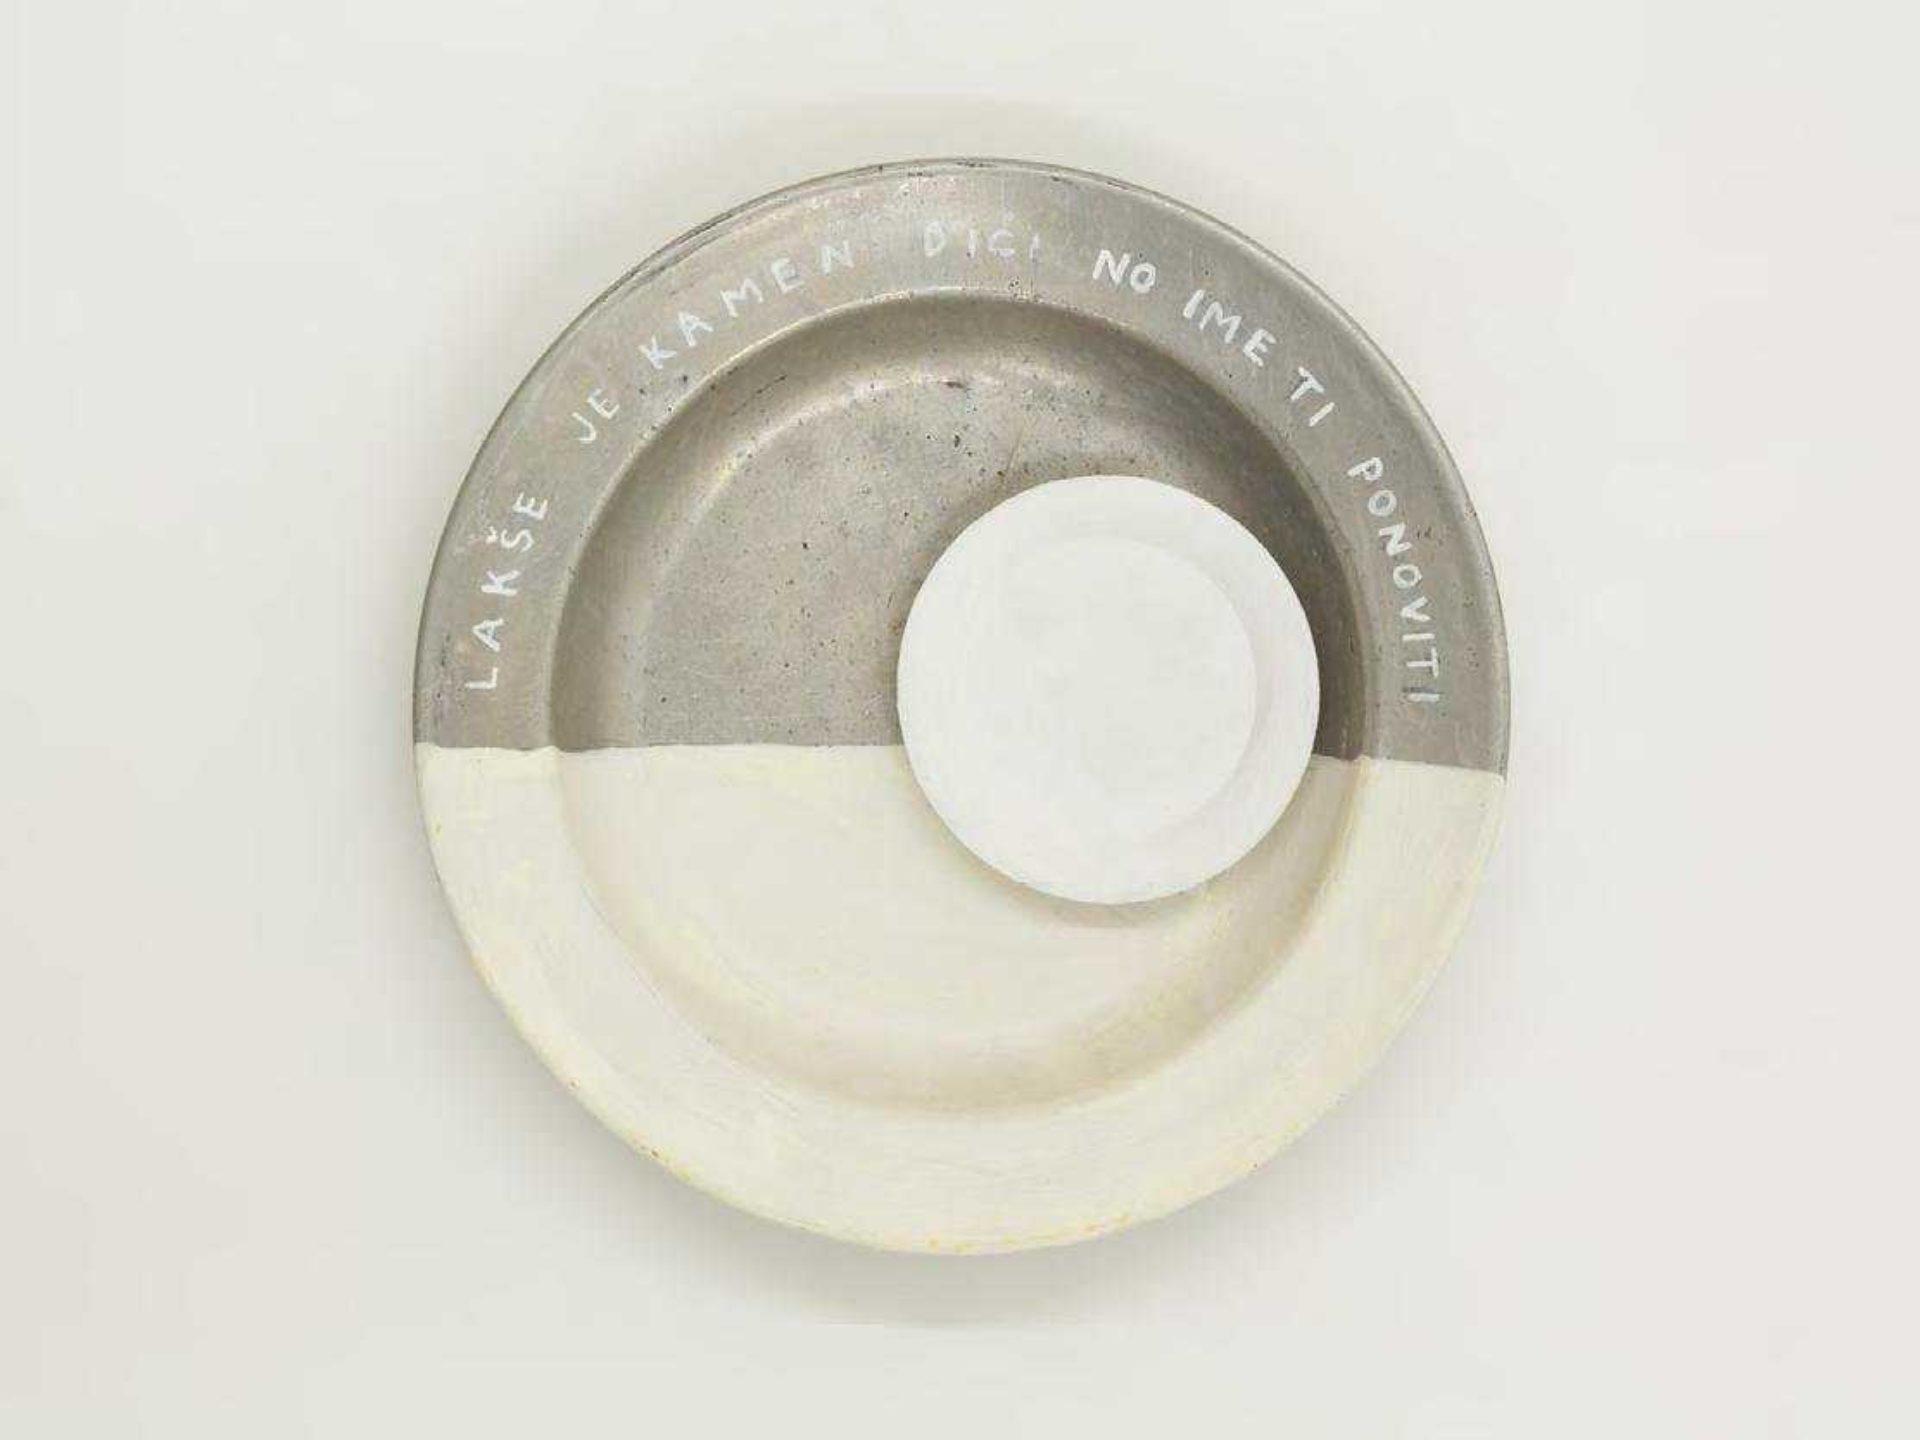 Mladen Stilinović, Lakse je kamen ime ti ponoviti (It's easier to lift a stone, than to repeat your name), 1994